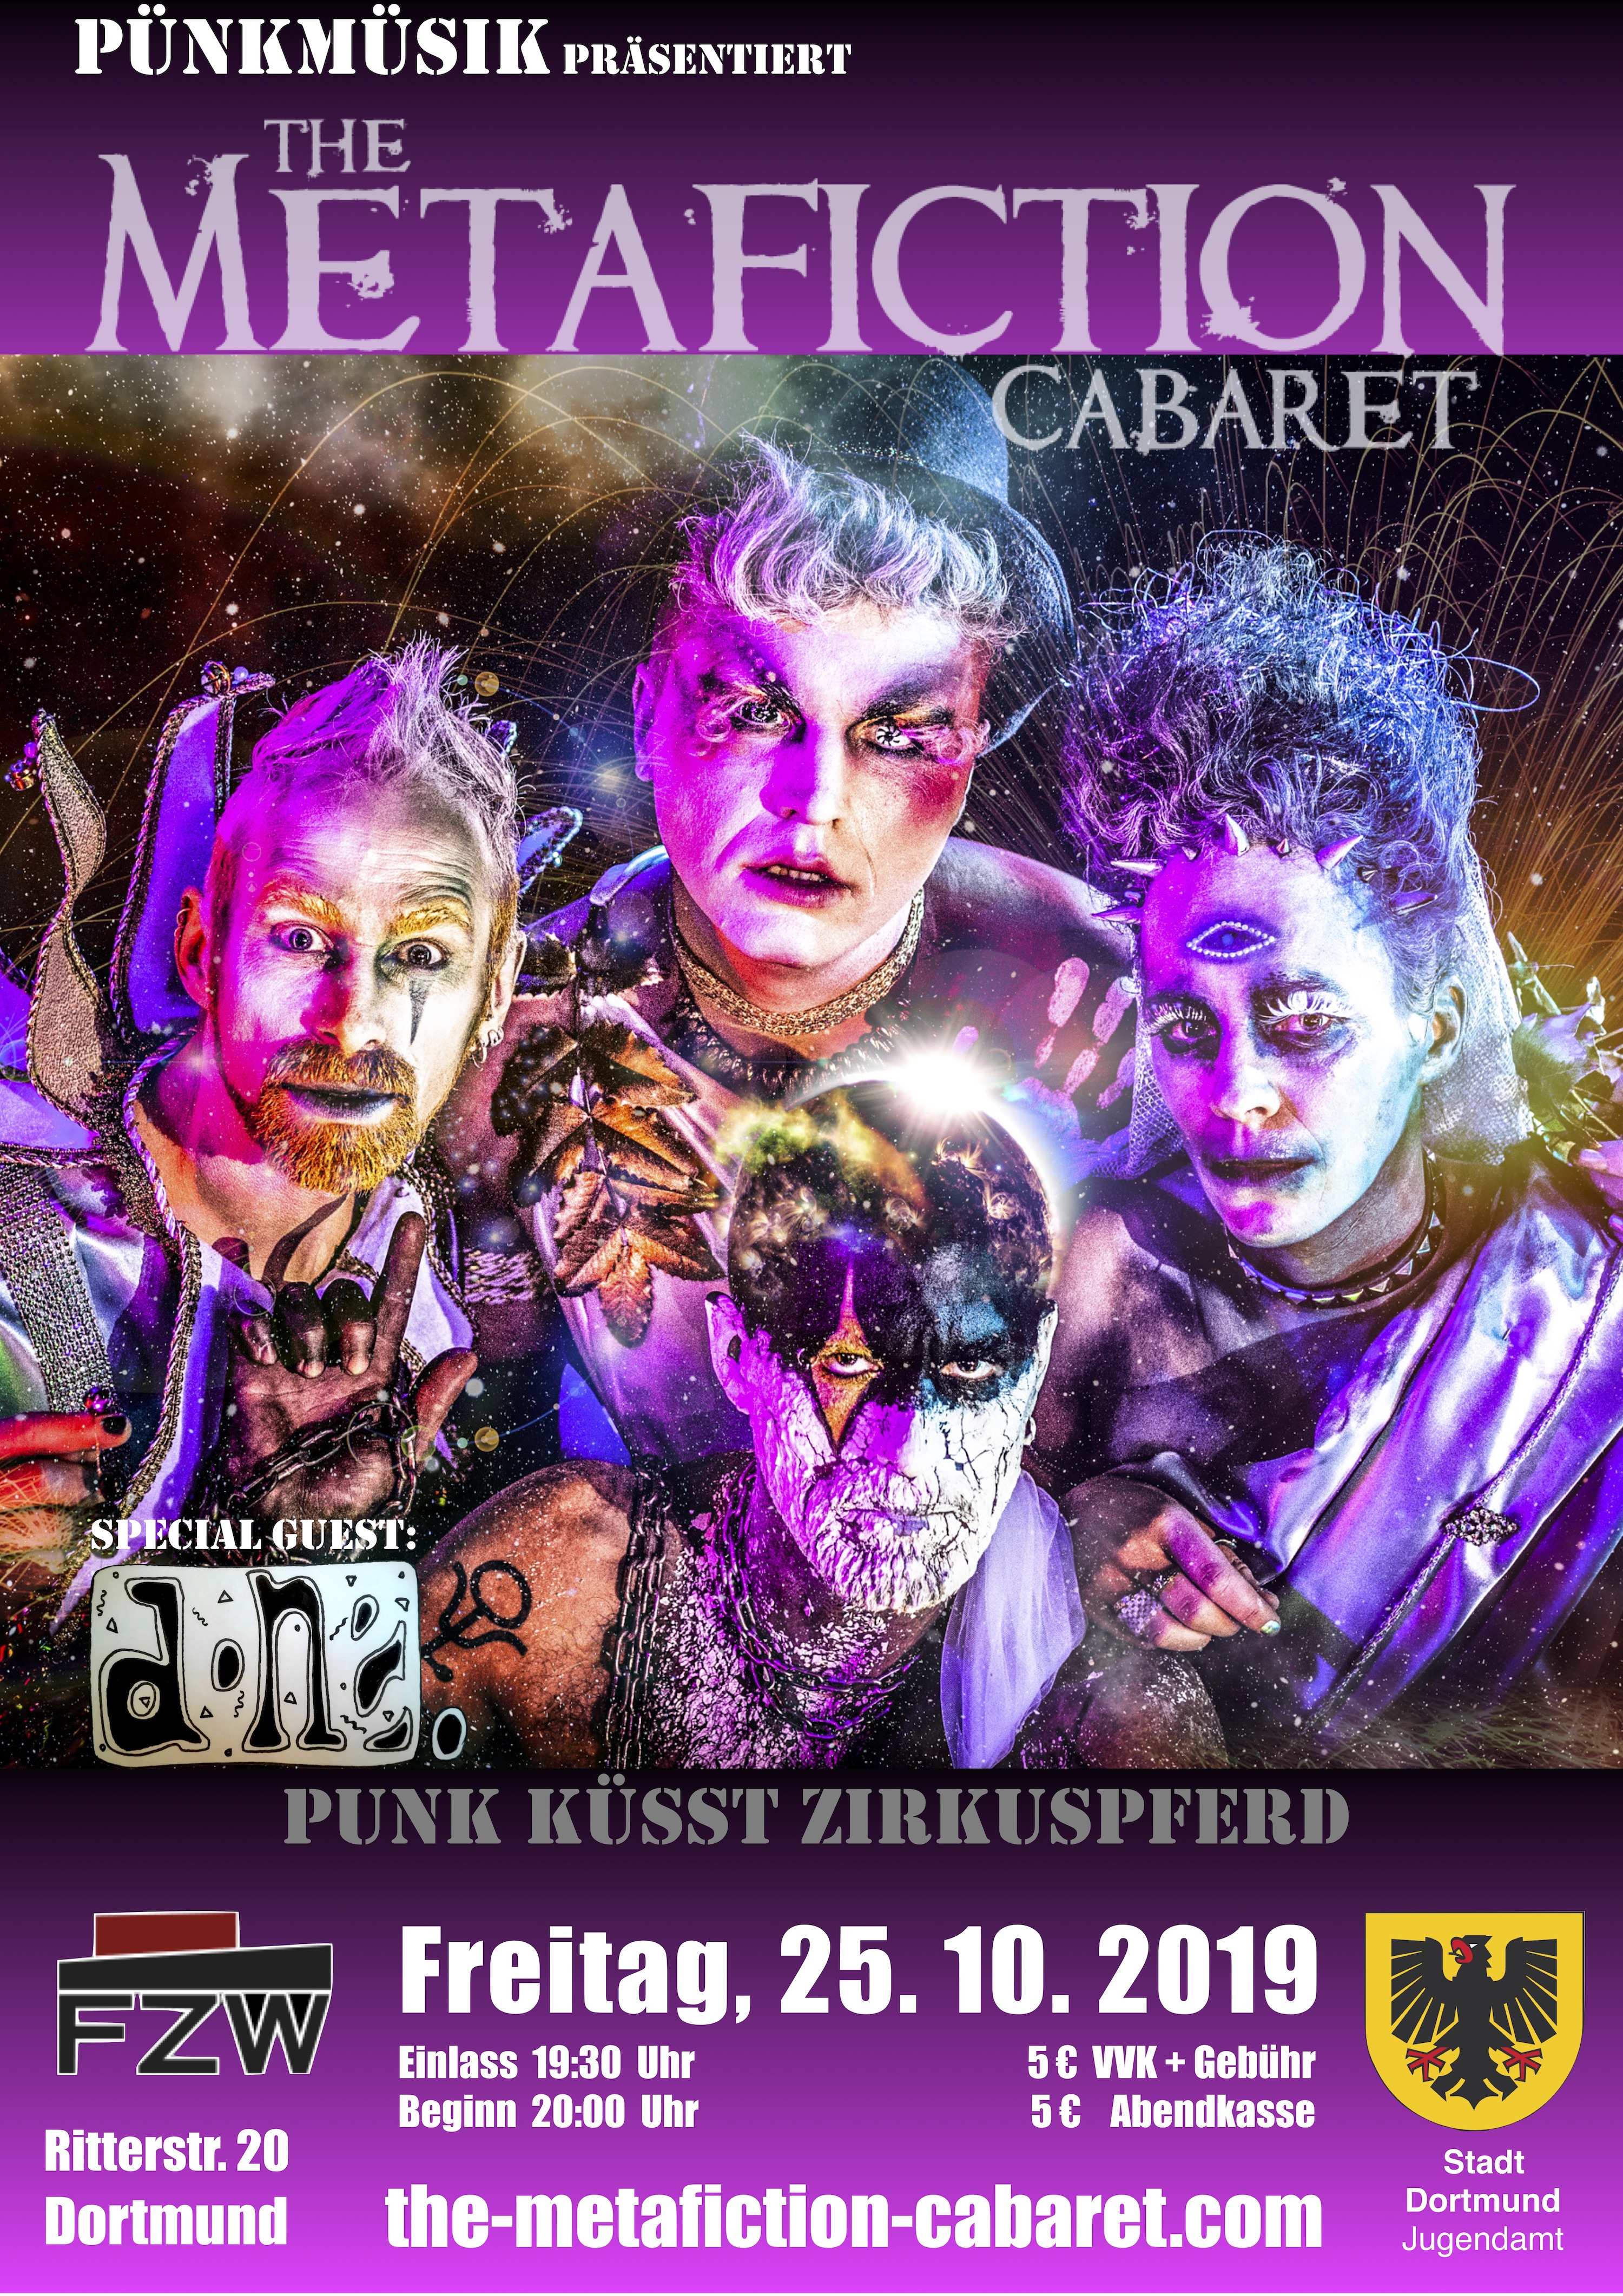 Circus Punk in Dortmund